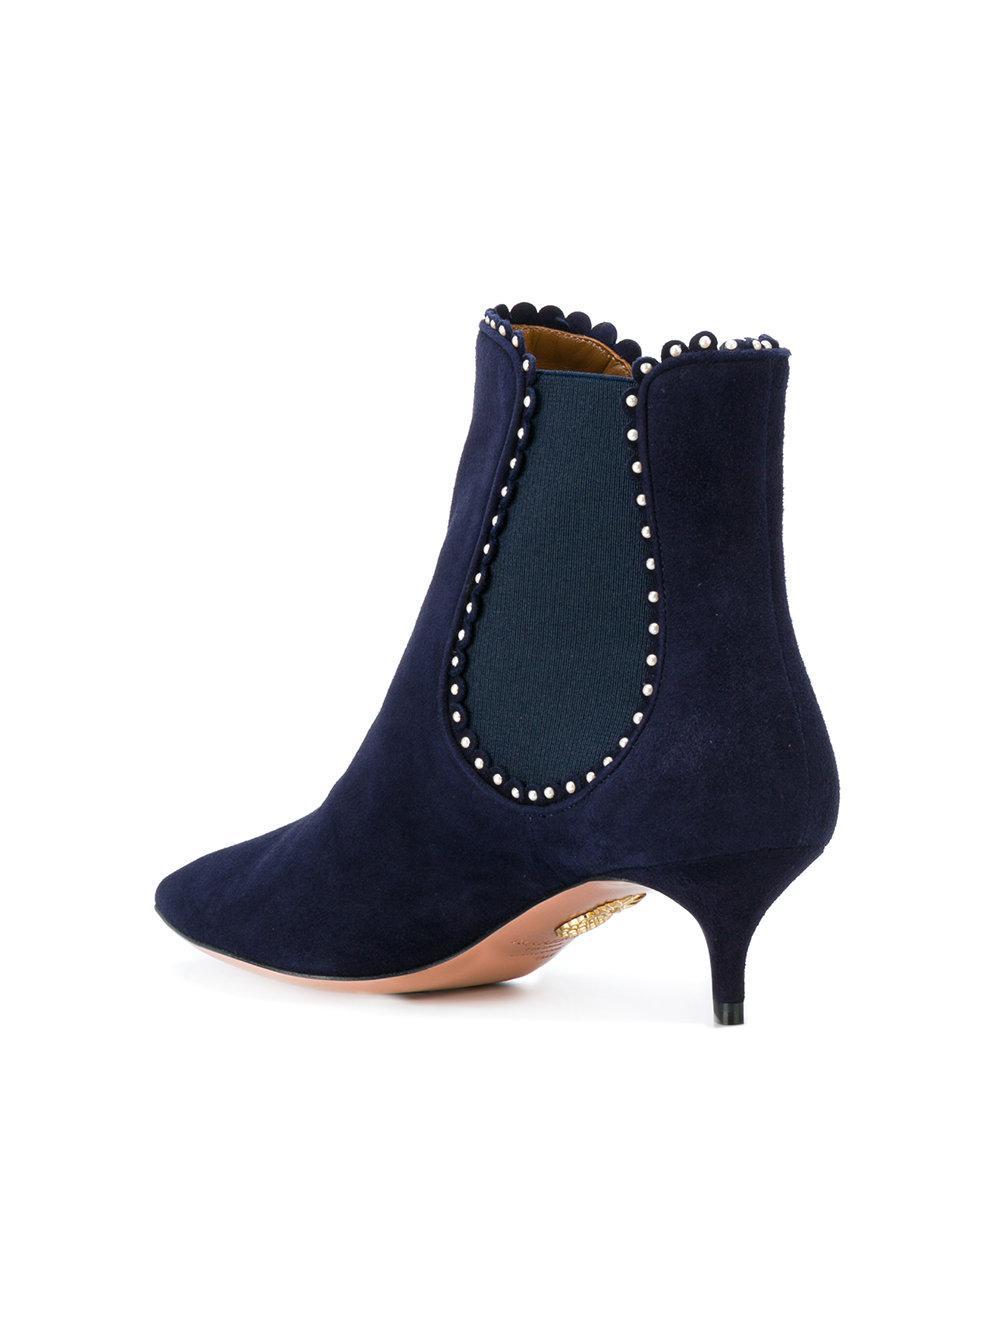 Aquazzura Suede Jicky Boots in Blue